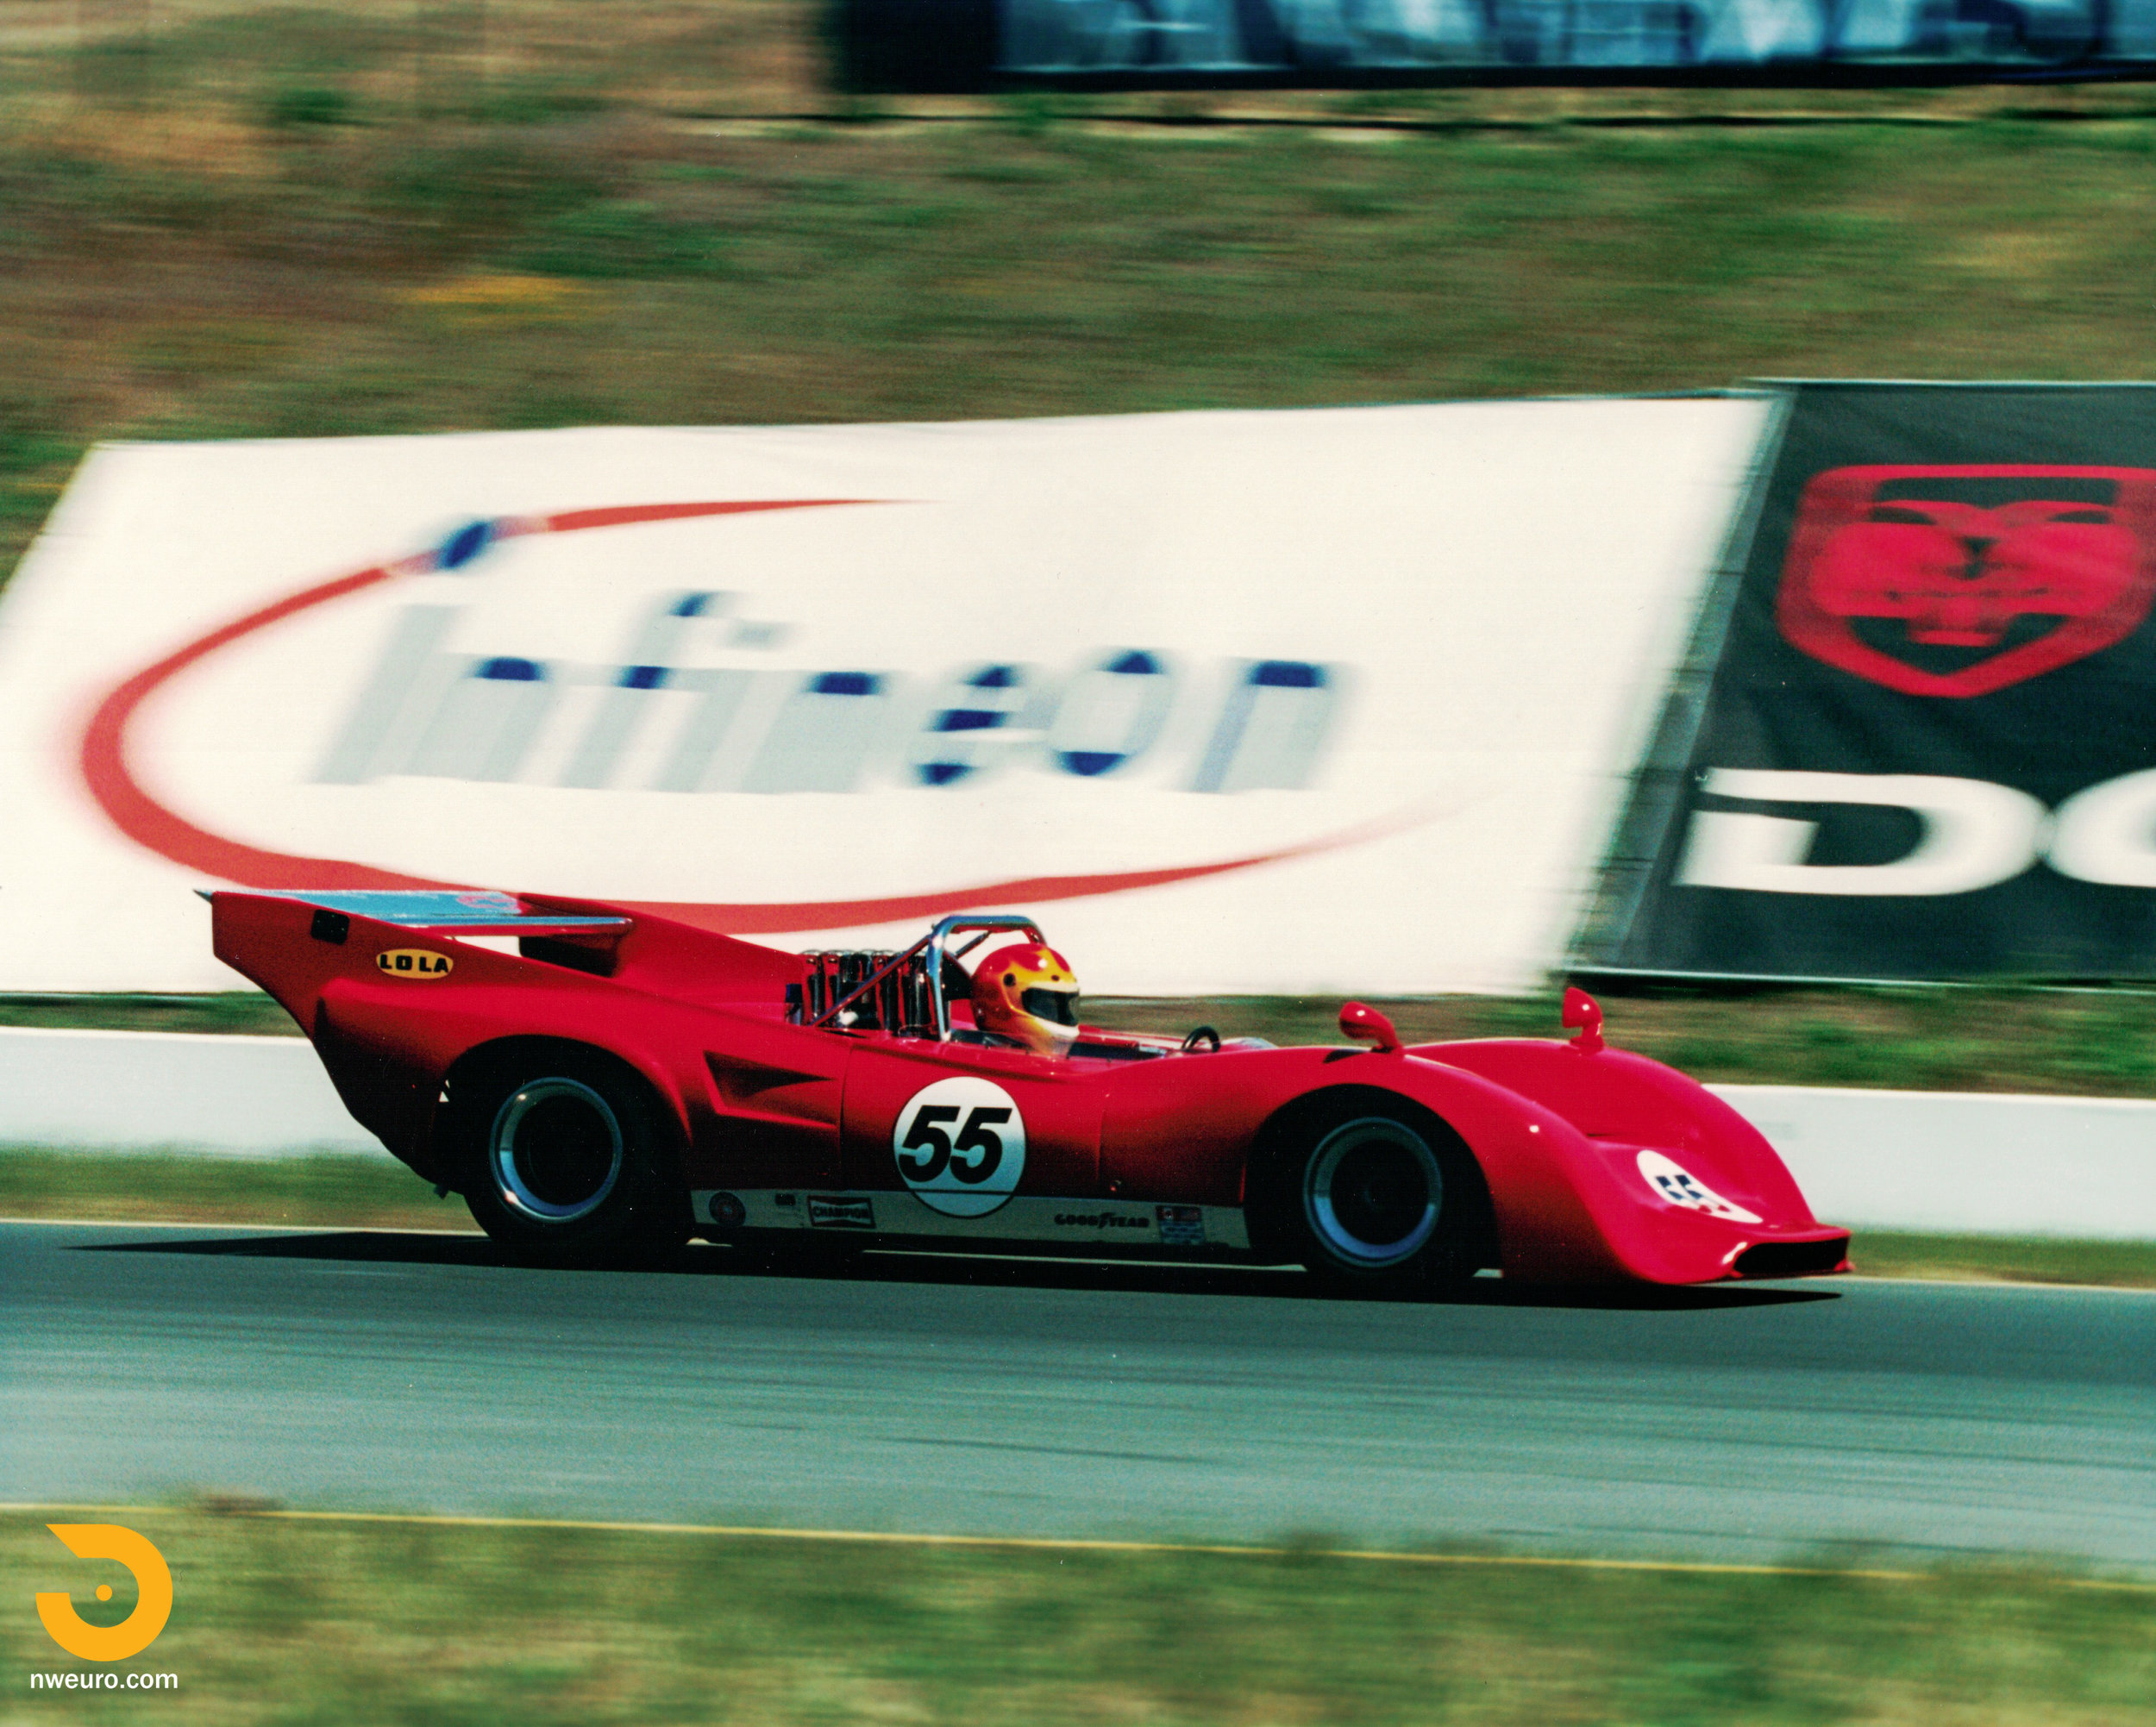 1969 Lola T162 Can-Am Race Car Action Shots-1.jpg